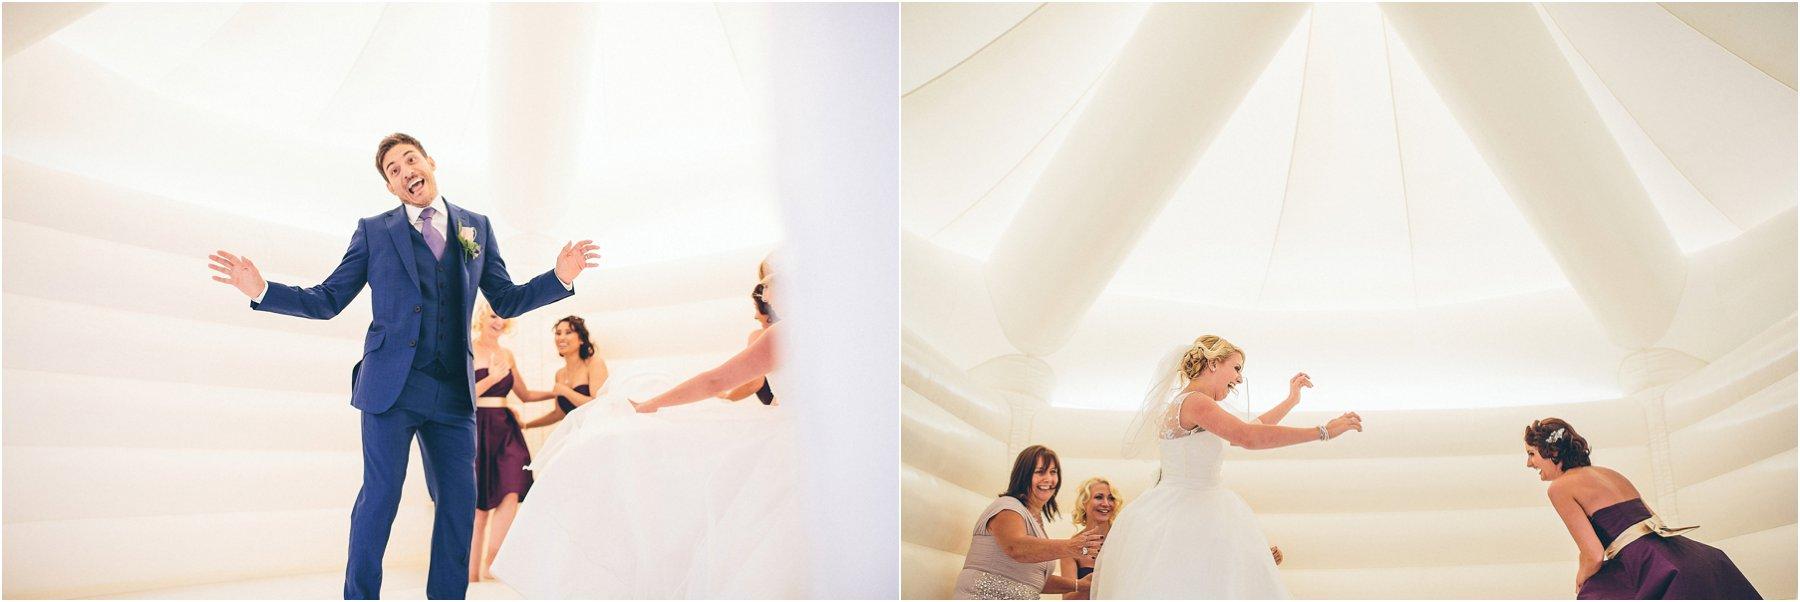 Thornton_Manor_Wedding_Photography_0075